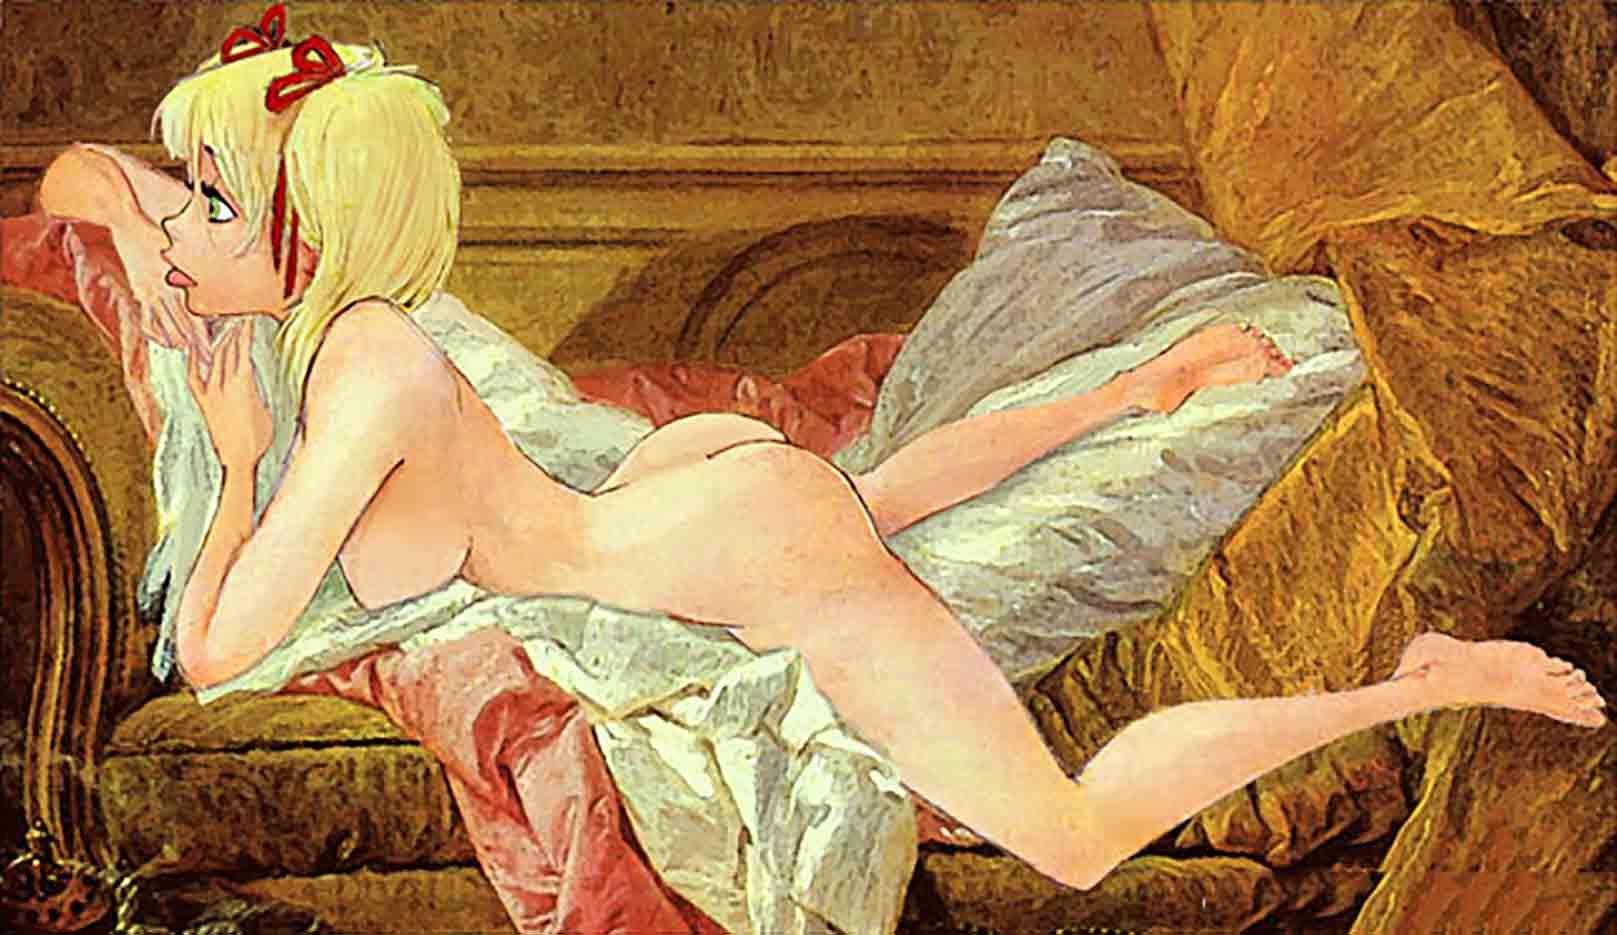 Cartoon Erotic